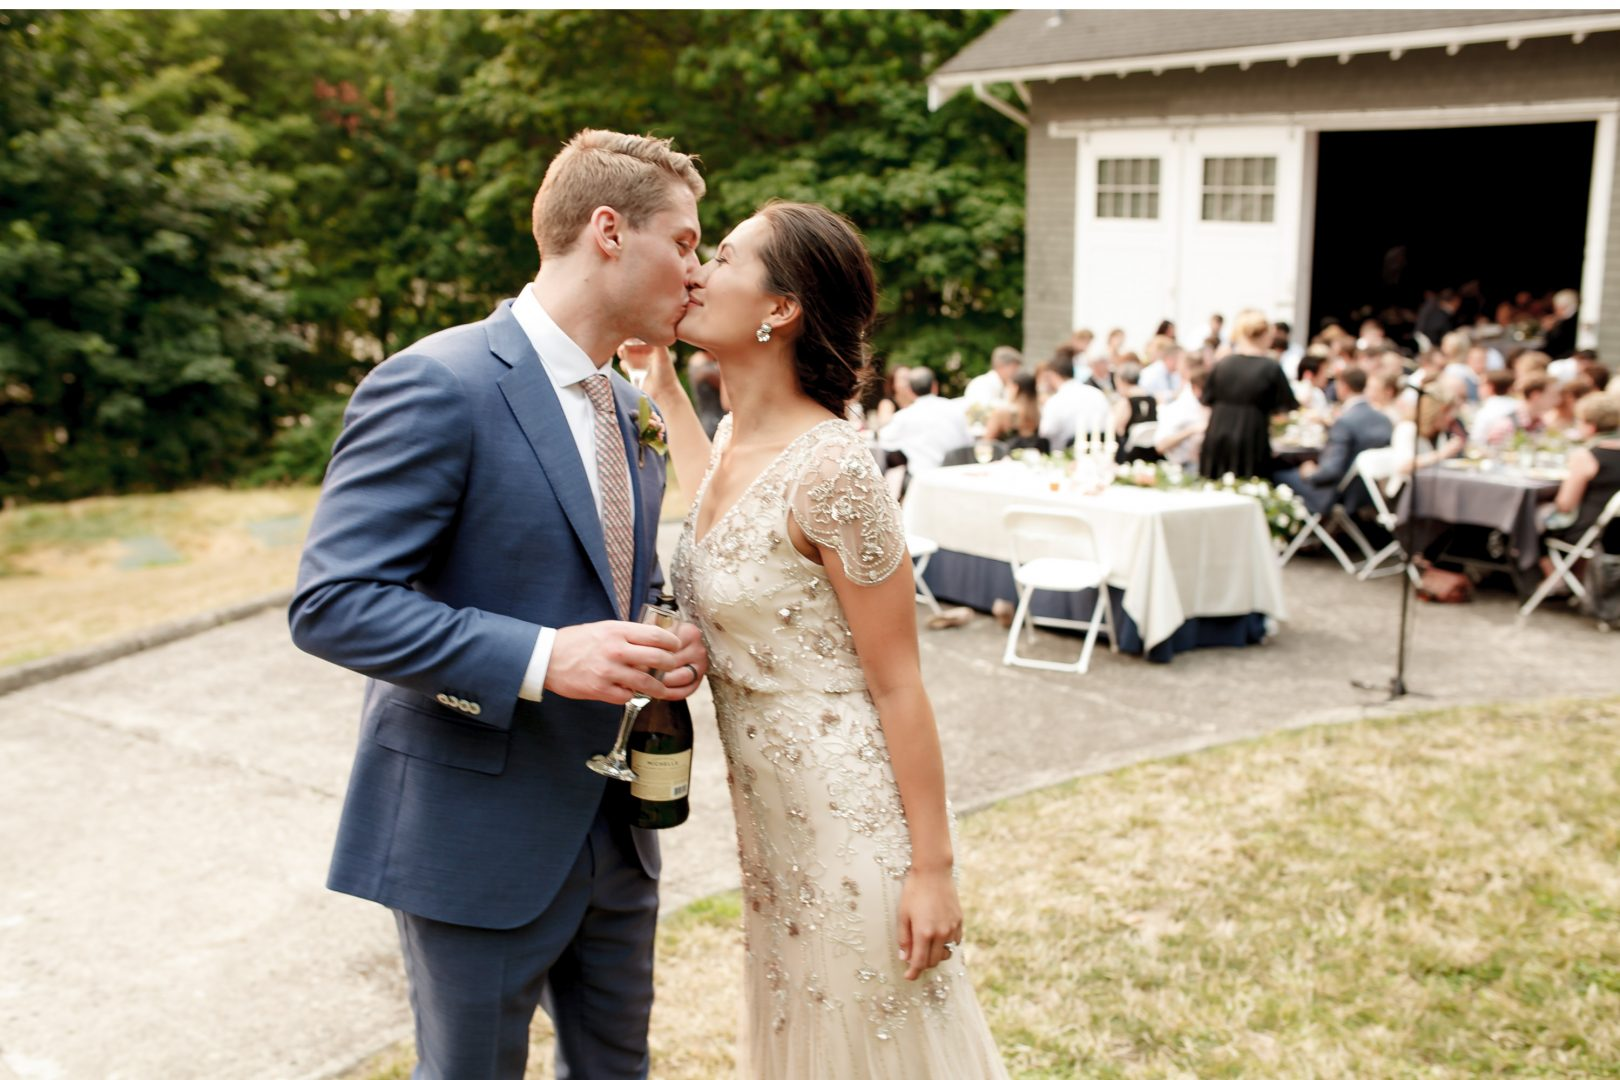 woodstock farm bellingham wedding venue cute couples kissing at wedding reception